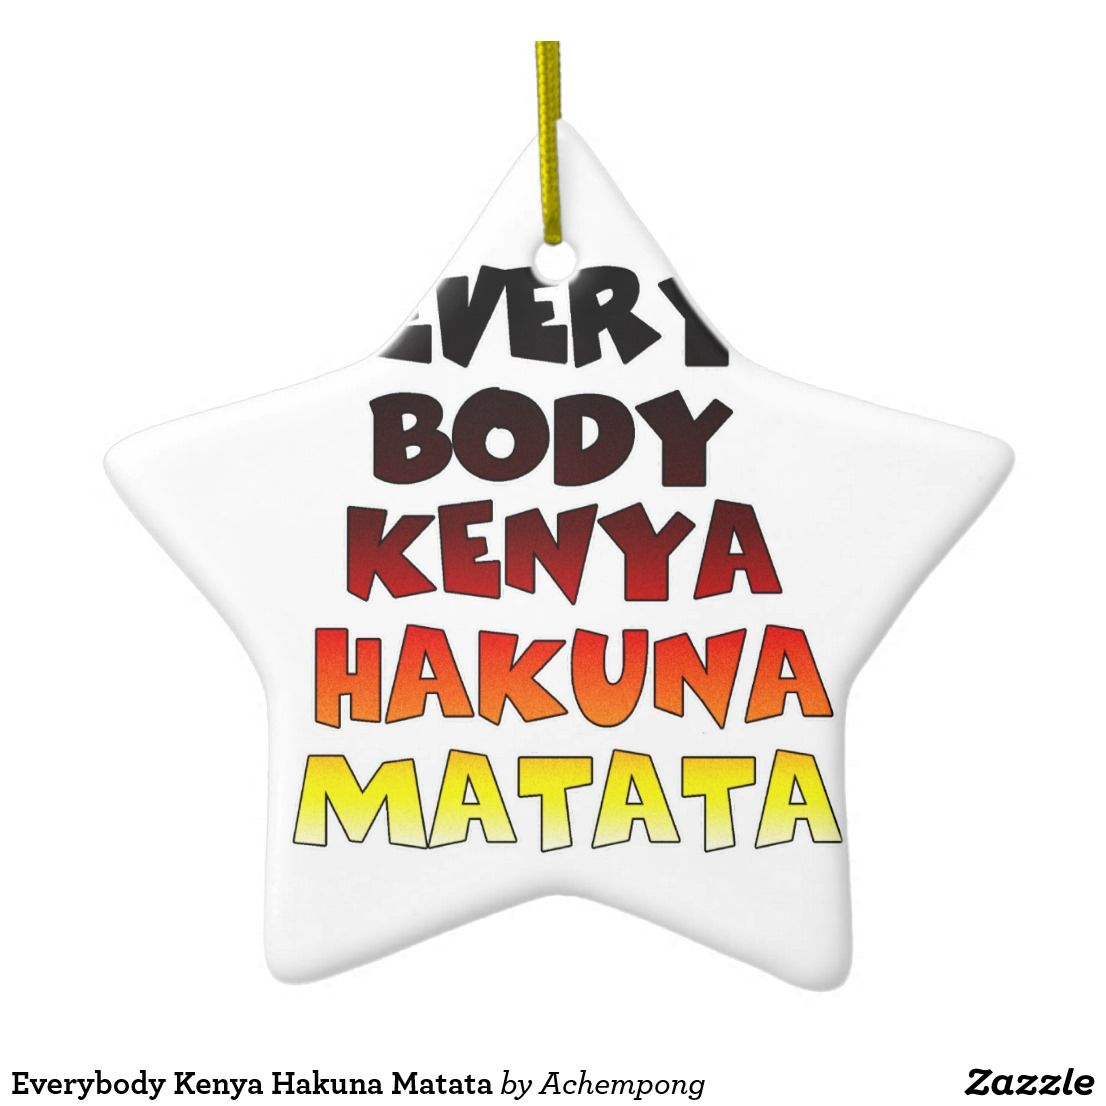 Everybody Kenya Hakuna Matata Home decor Holiday Decor